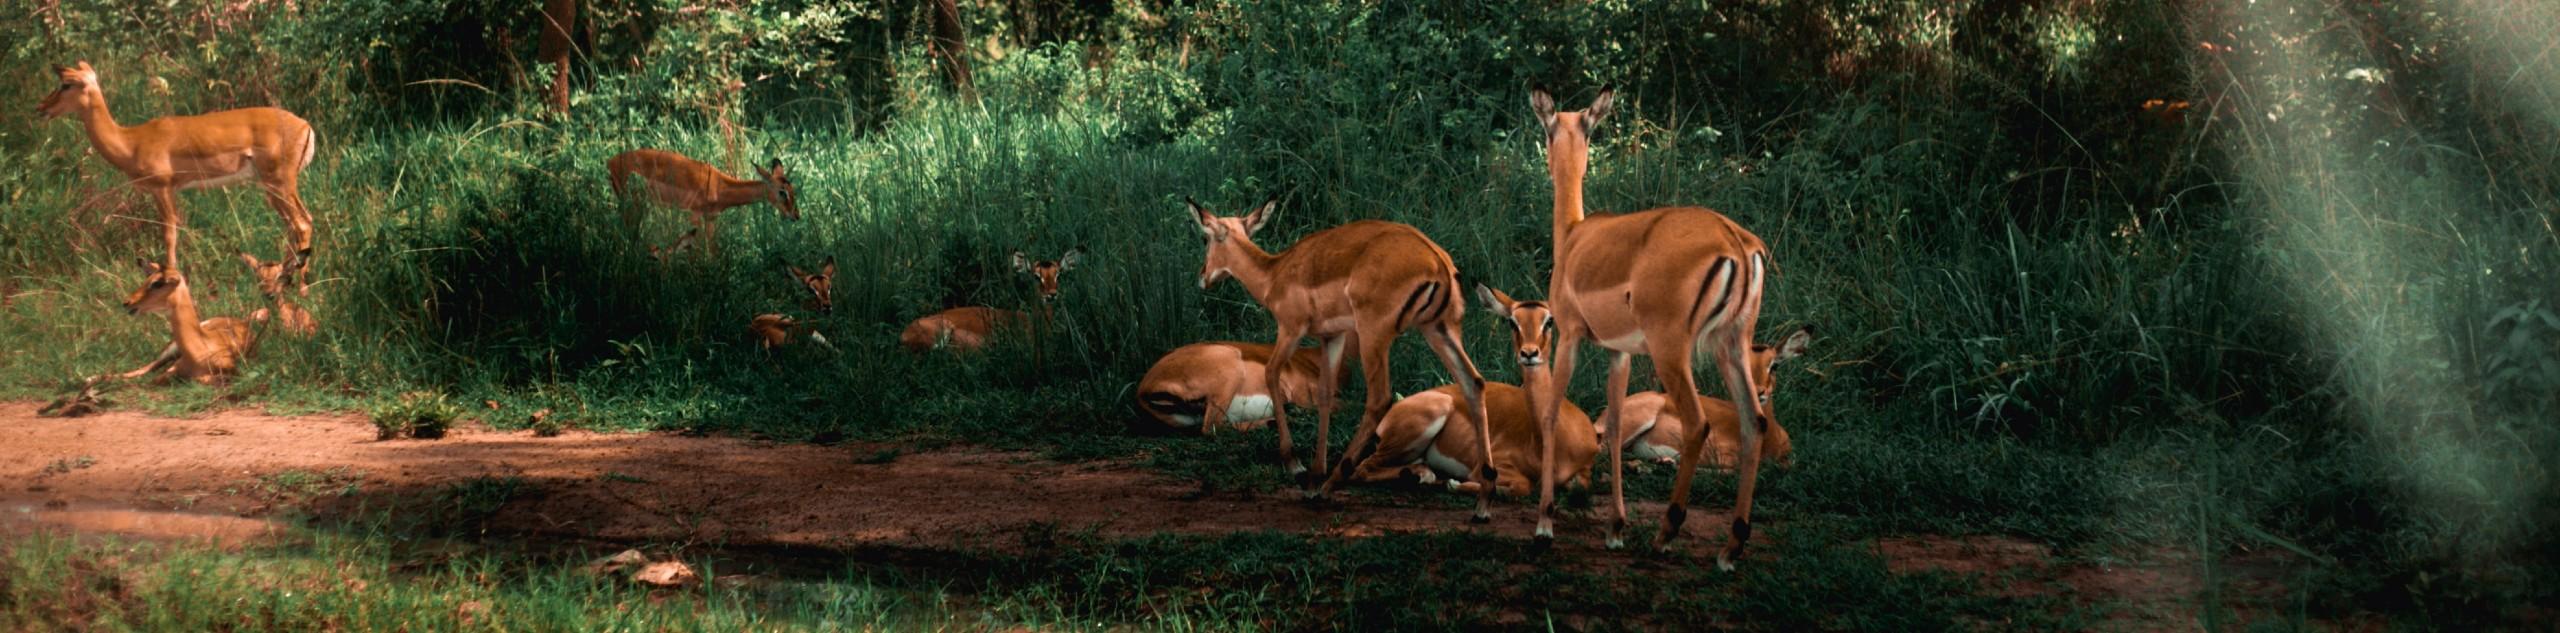 Herd of antelopes in Rwanda